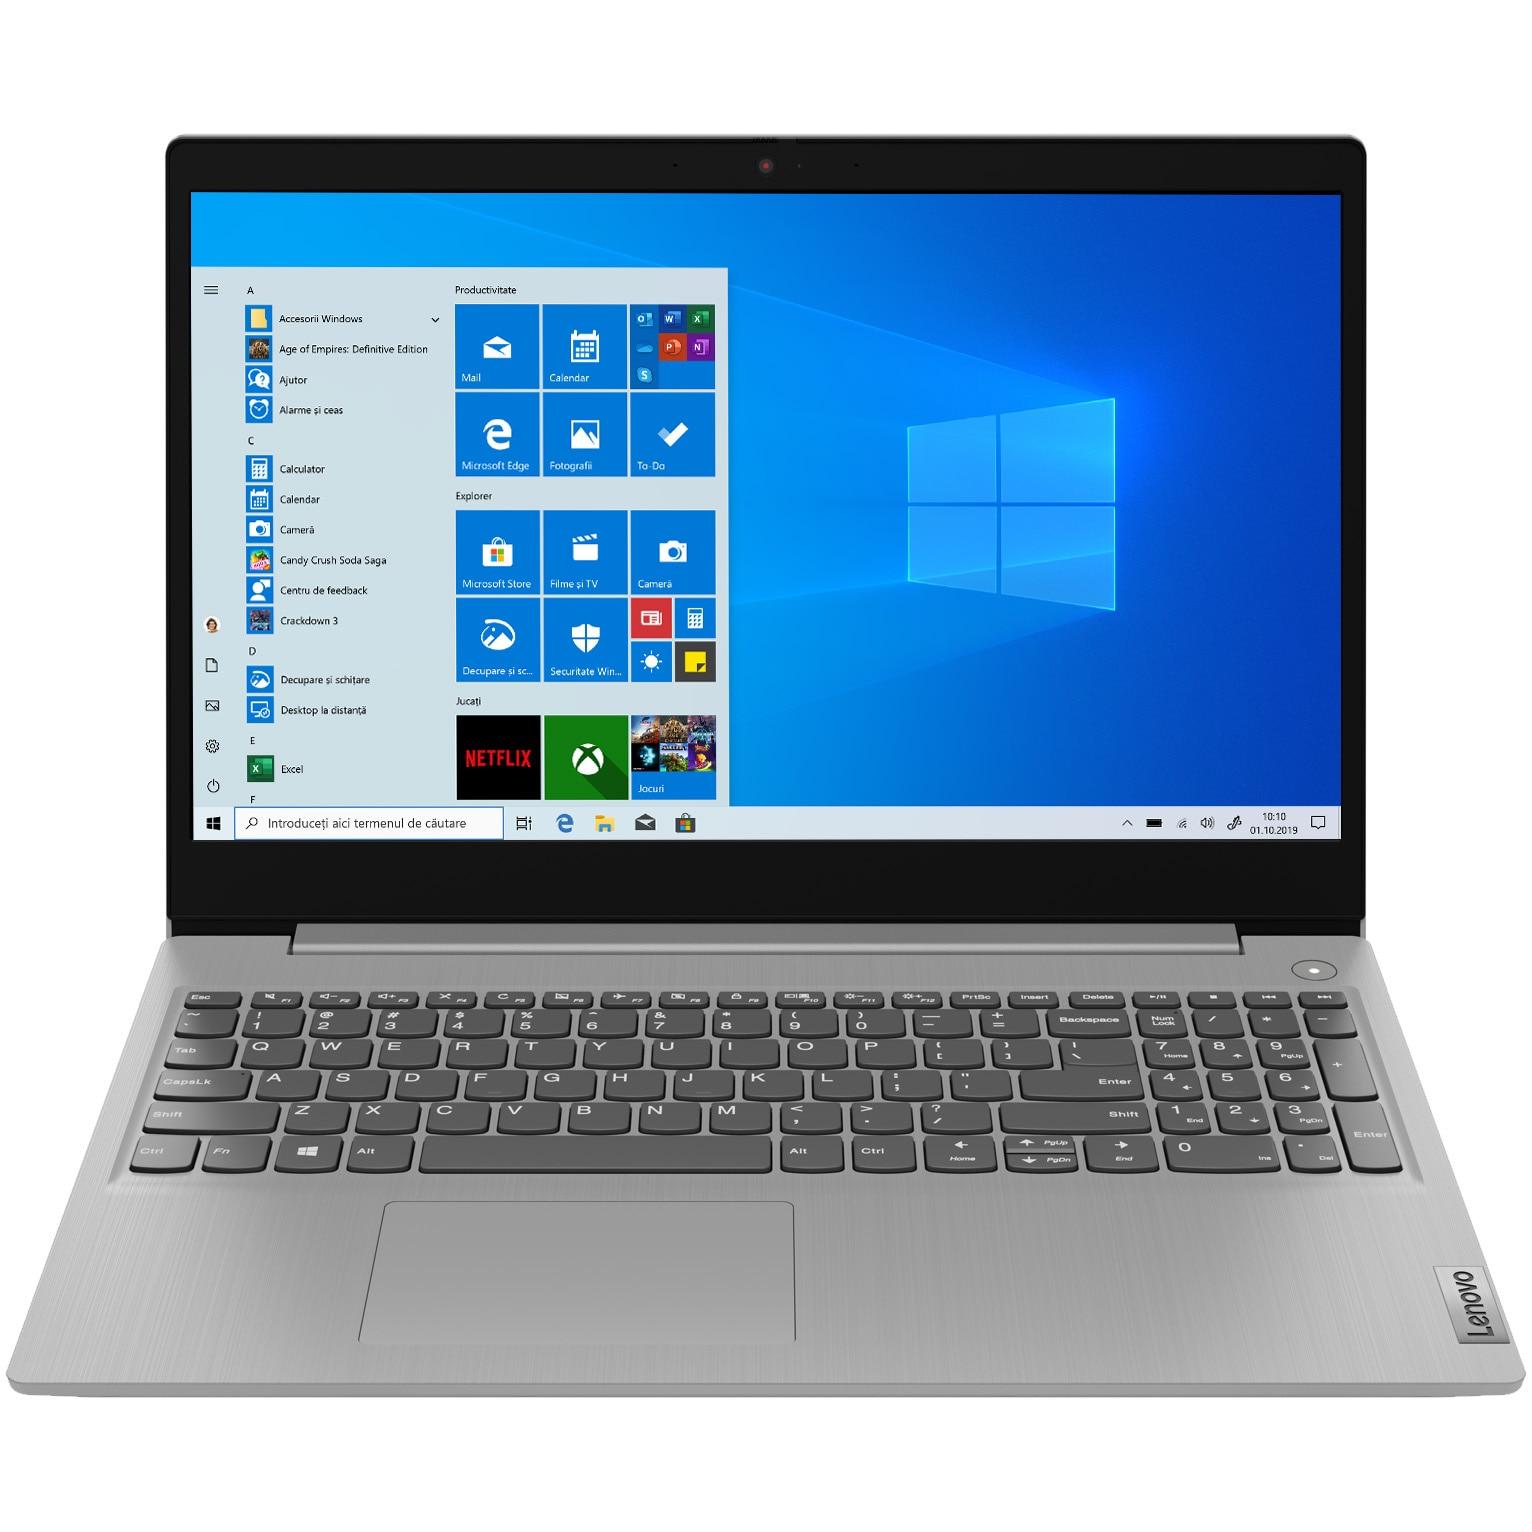 "Fotografie Laptop Lenovo IdeaPad 3 15ADA05 cu procesor AMD Ryzen 3 3250U pana la 3.50 Ghz, 15.6"", Full HD, 4GB, 128GB SSD, AMD Radeon Graphics, Windows 10 Home S, Platinum Grey"